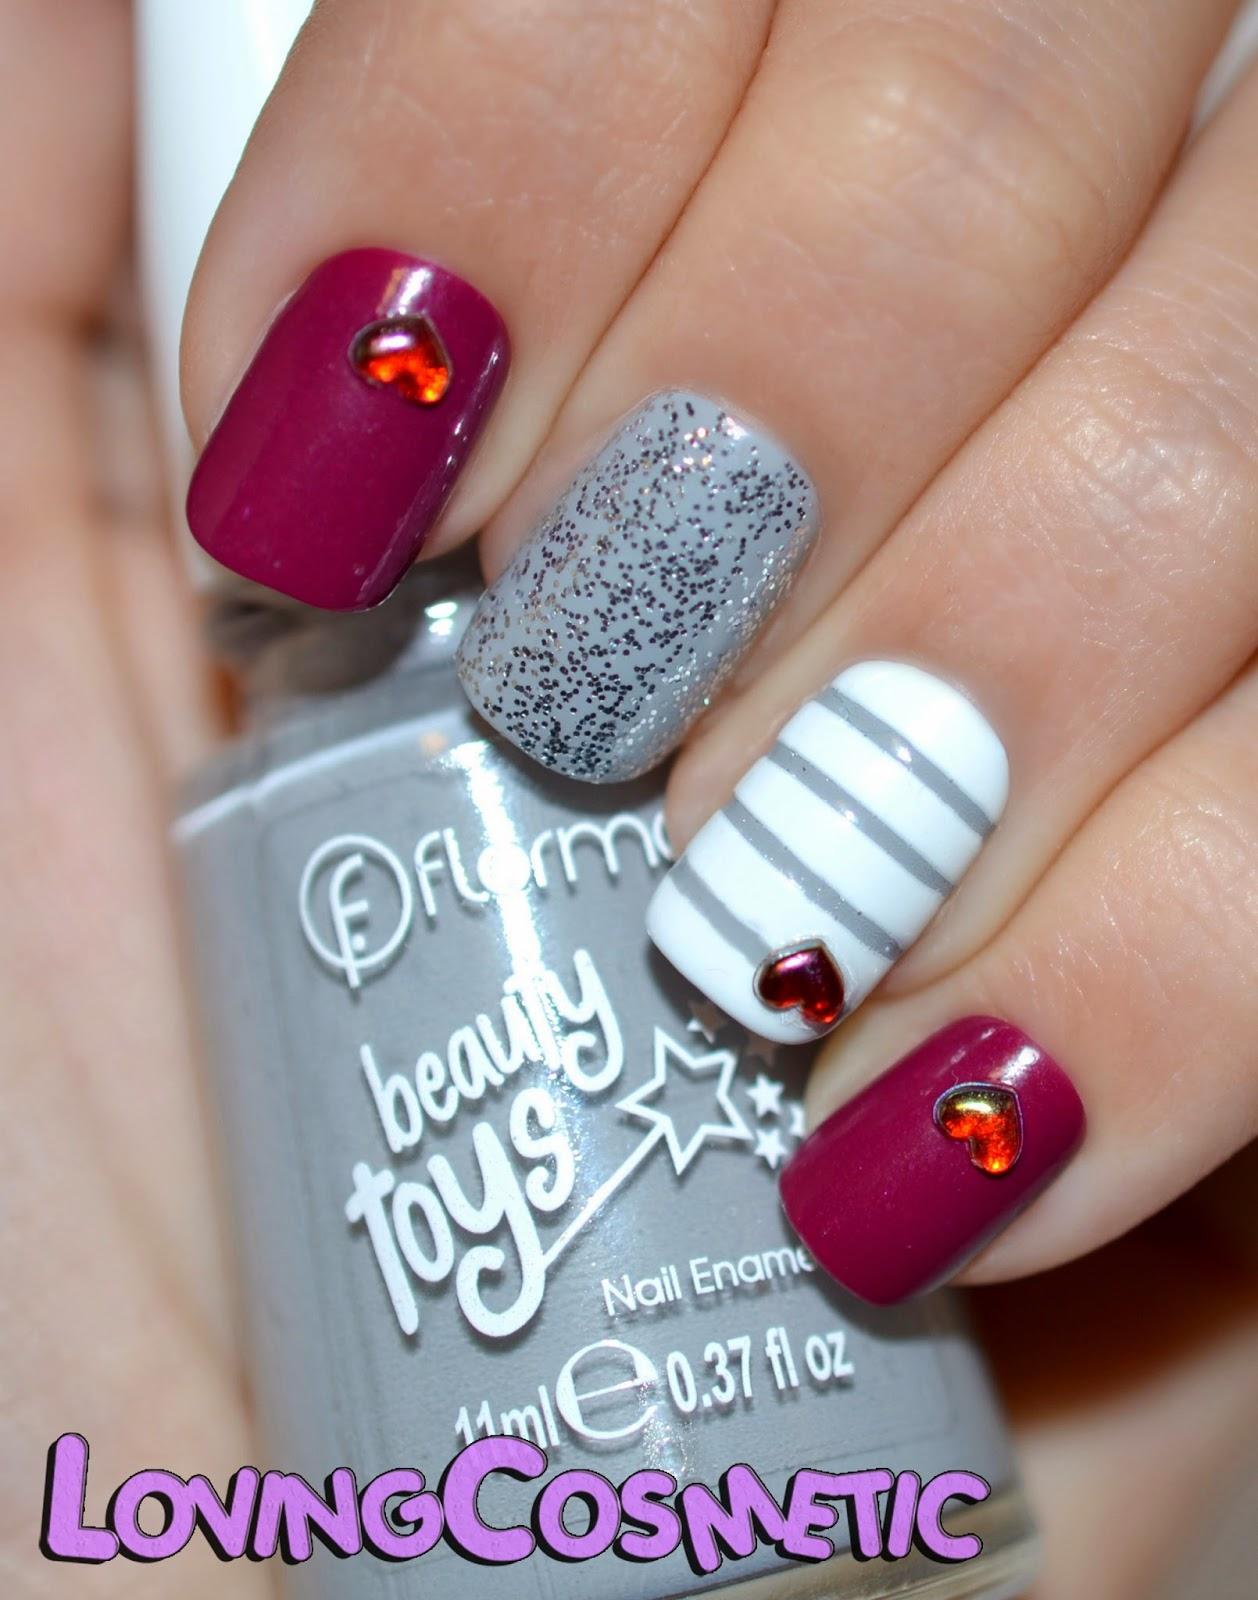 Bornprettystore gris blanco corazones decoracion rhinestones heart flormar beautytoys princess castle